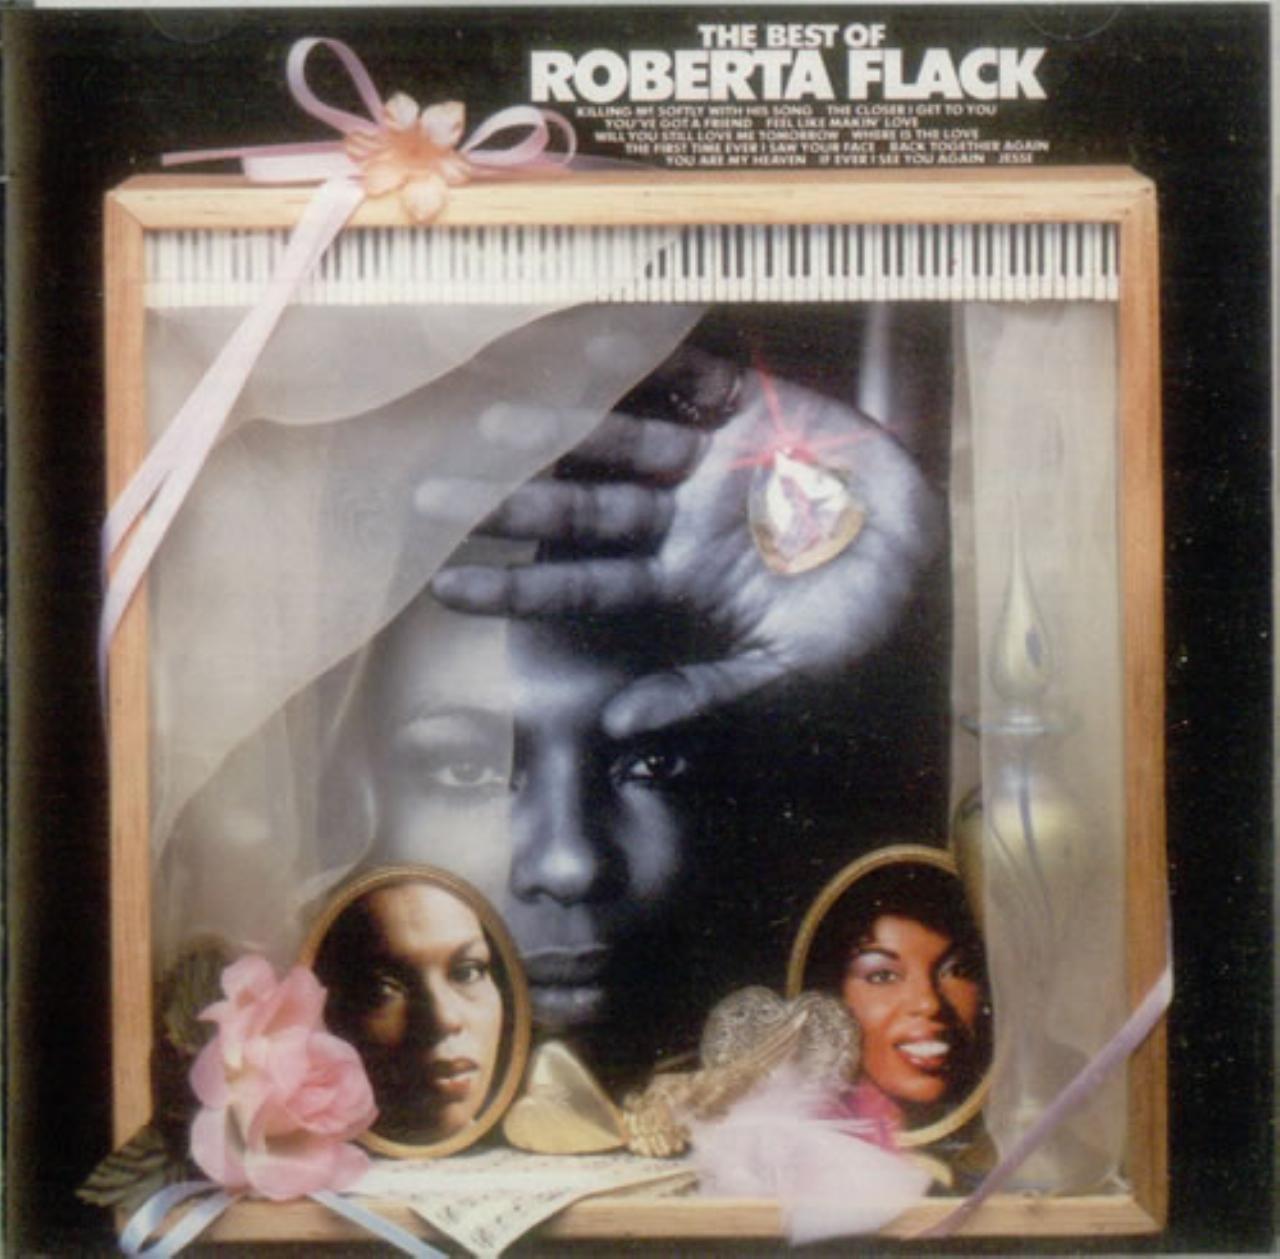 Genuine 35% OFF The Best Of Roberta Flack